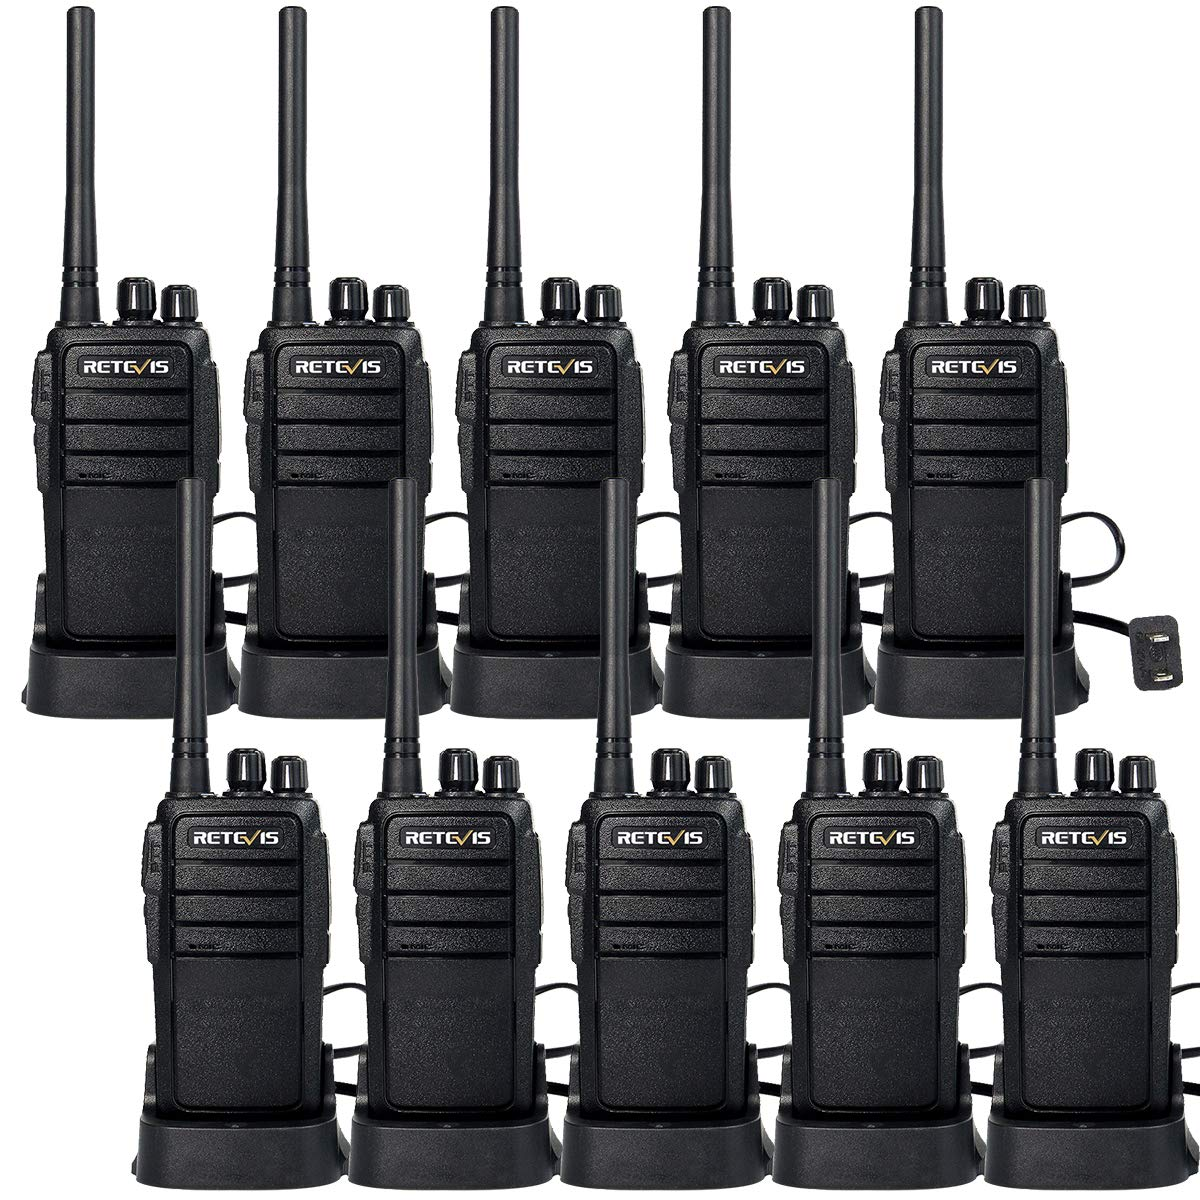 10 Pack Retevis RT21 Walkie Talkies FRS Radio 2 Way Radios FCC 16CH CTCSS//DCS VOX License Free Two Way Radio